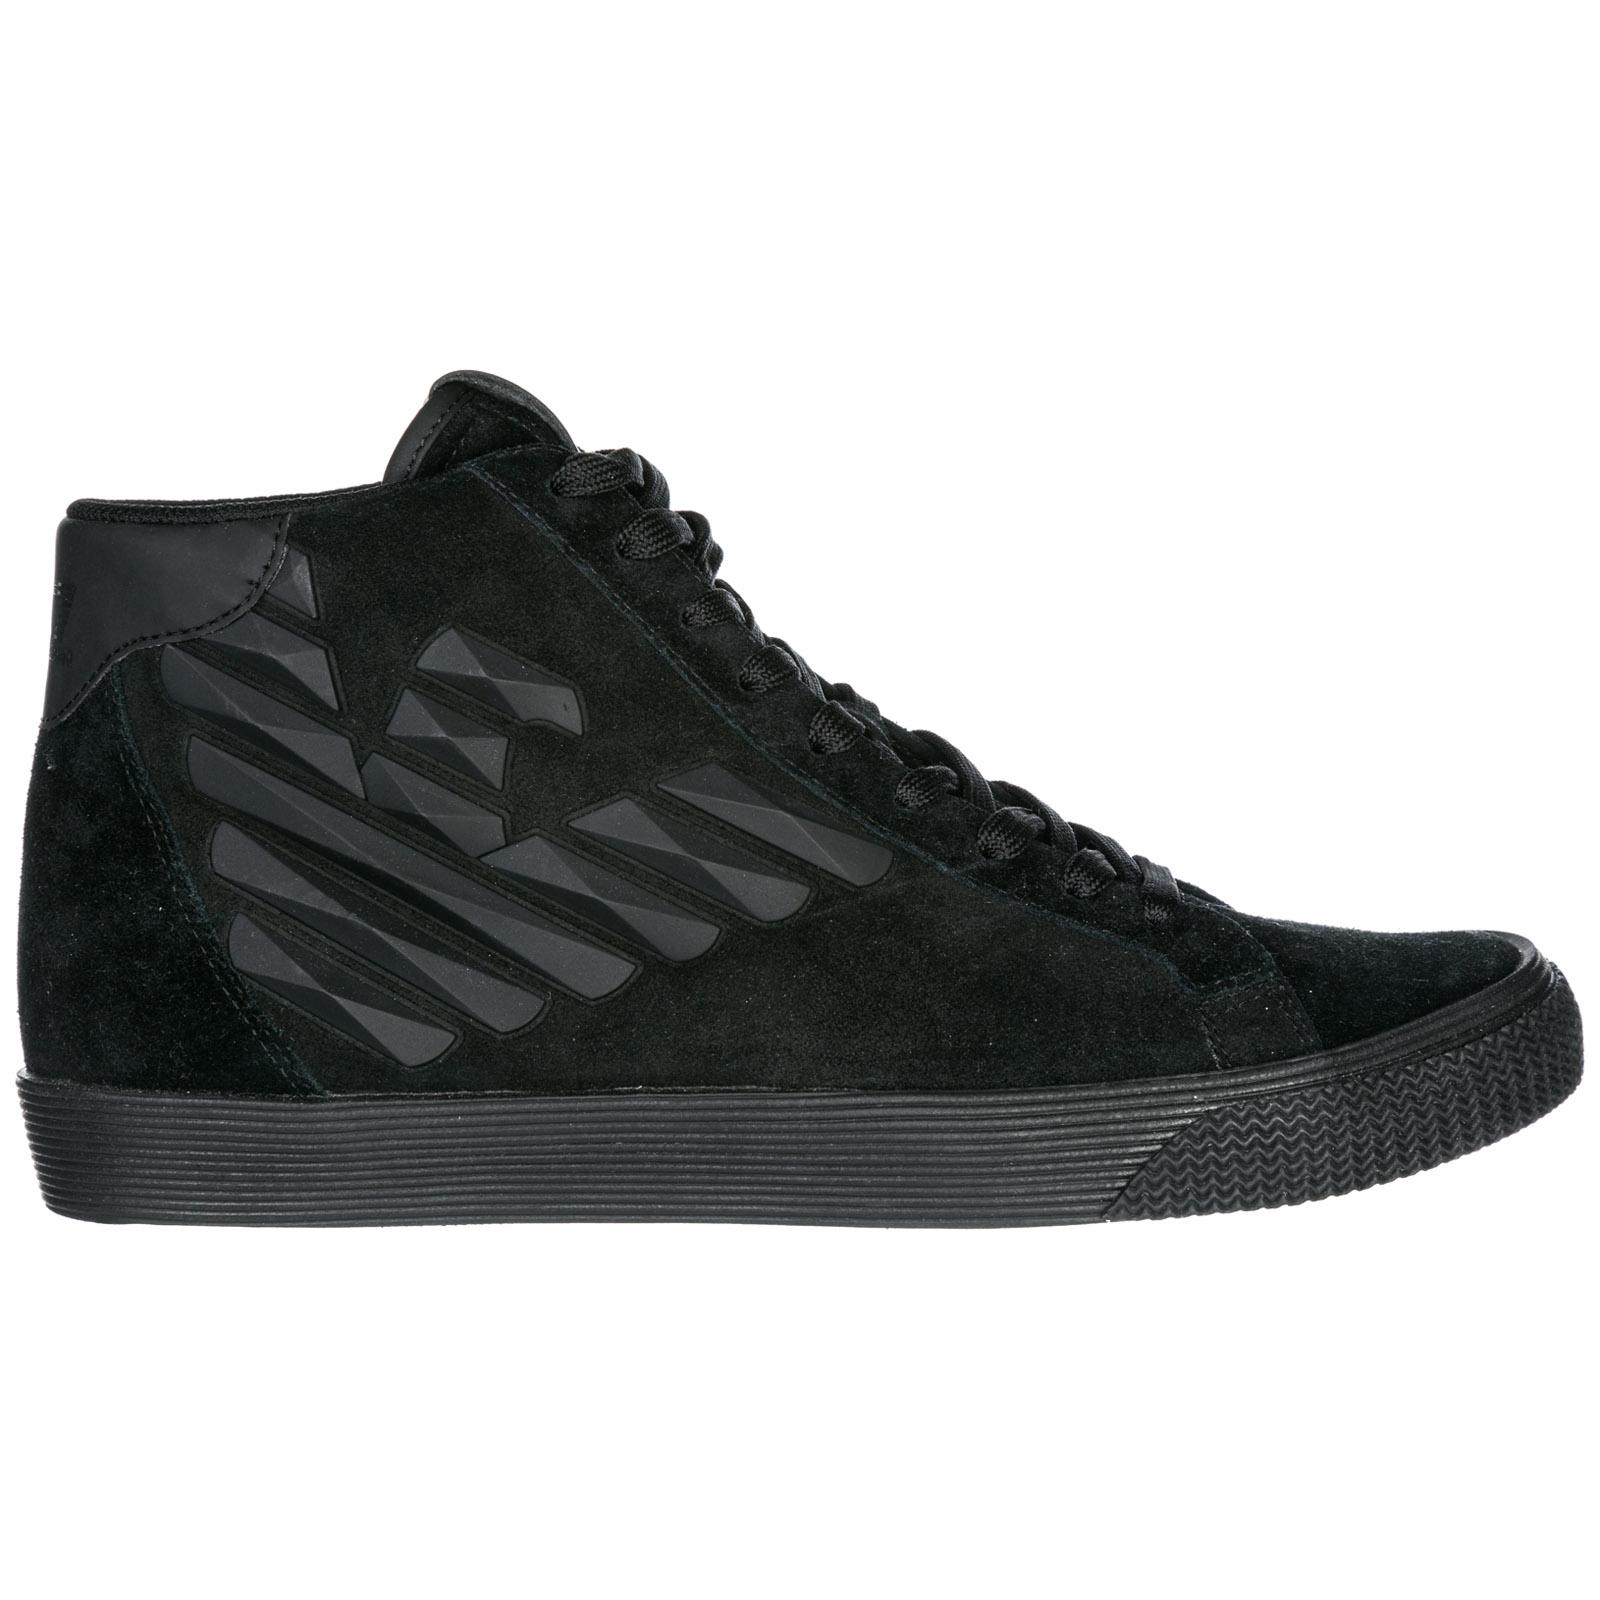 Sneakers alte Emporio Armani EA7 2480107A29900020 black  a3a468437ac